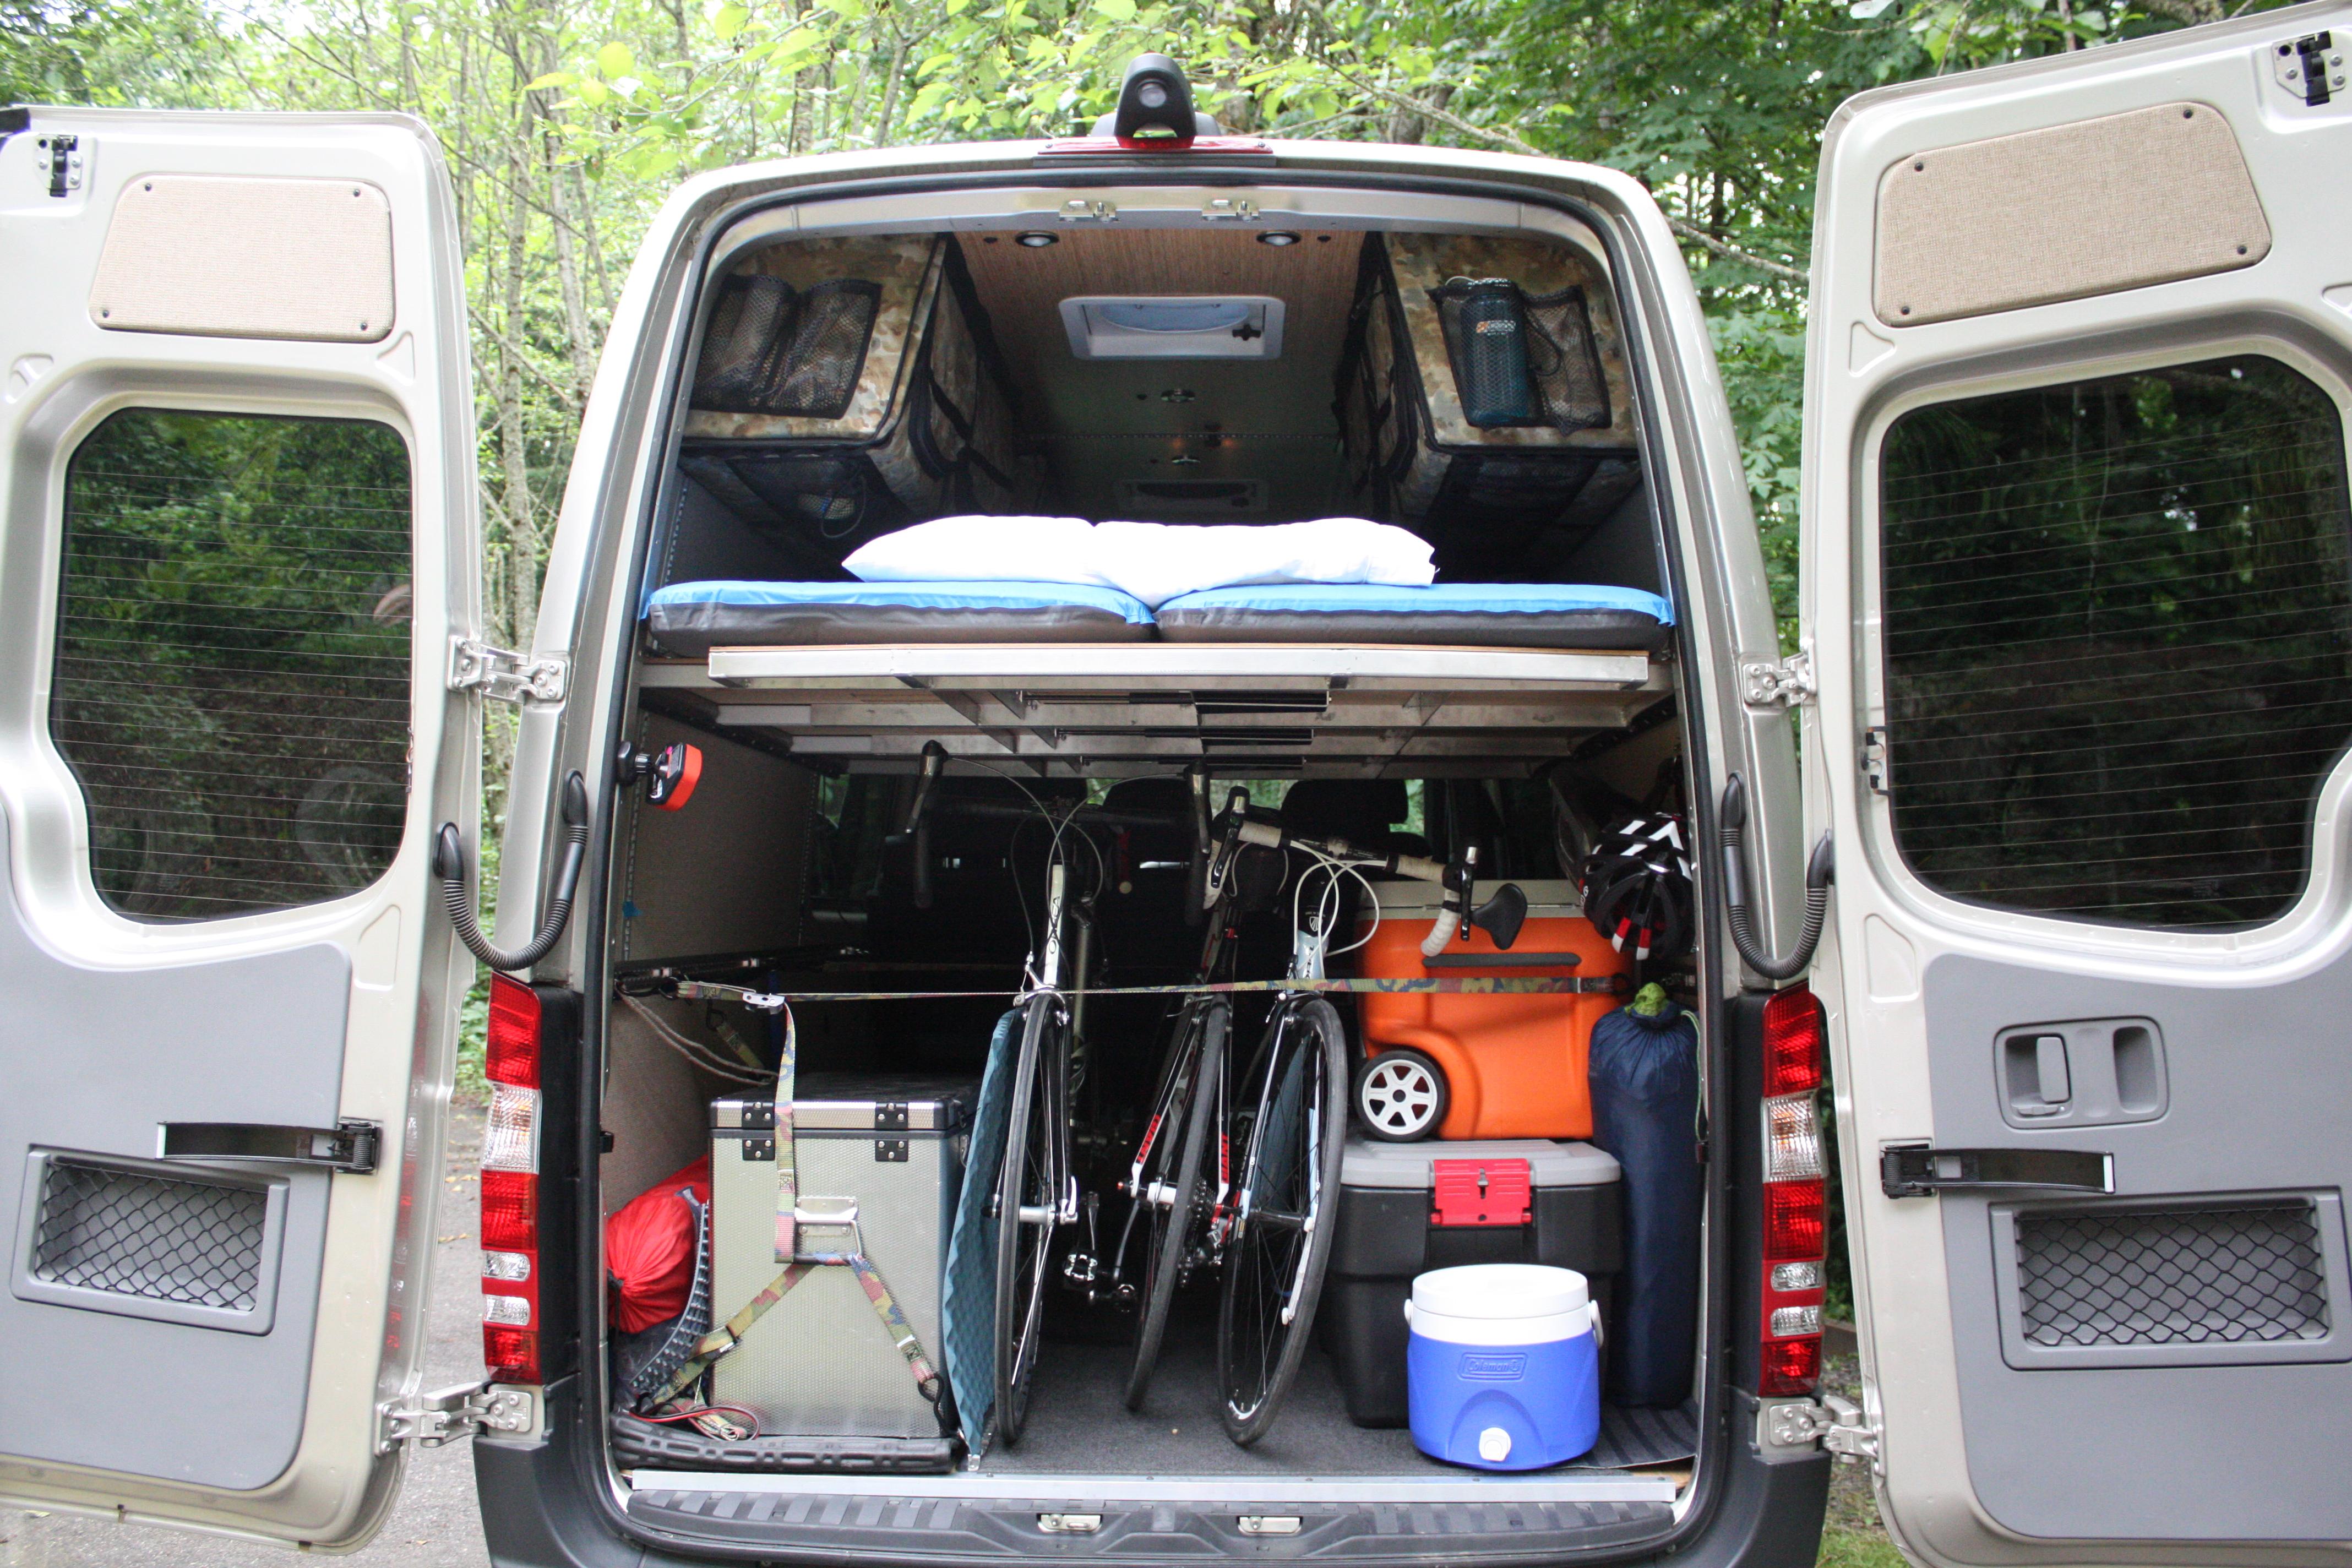 Modular kits let you DIY your own camper van